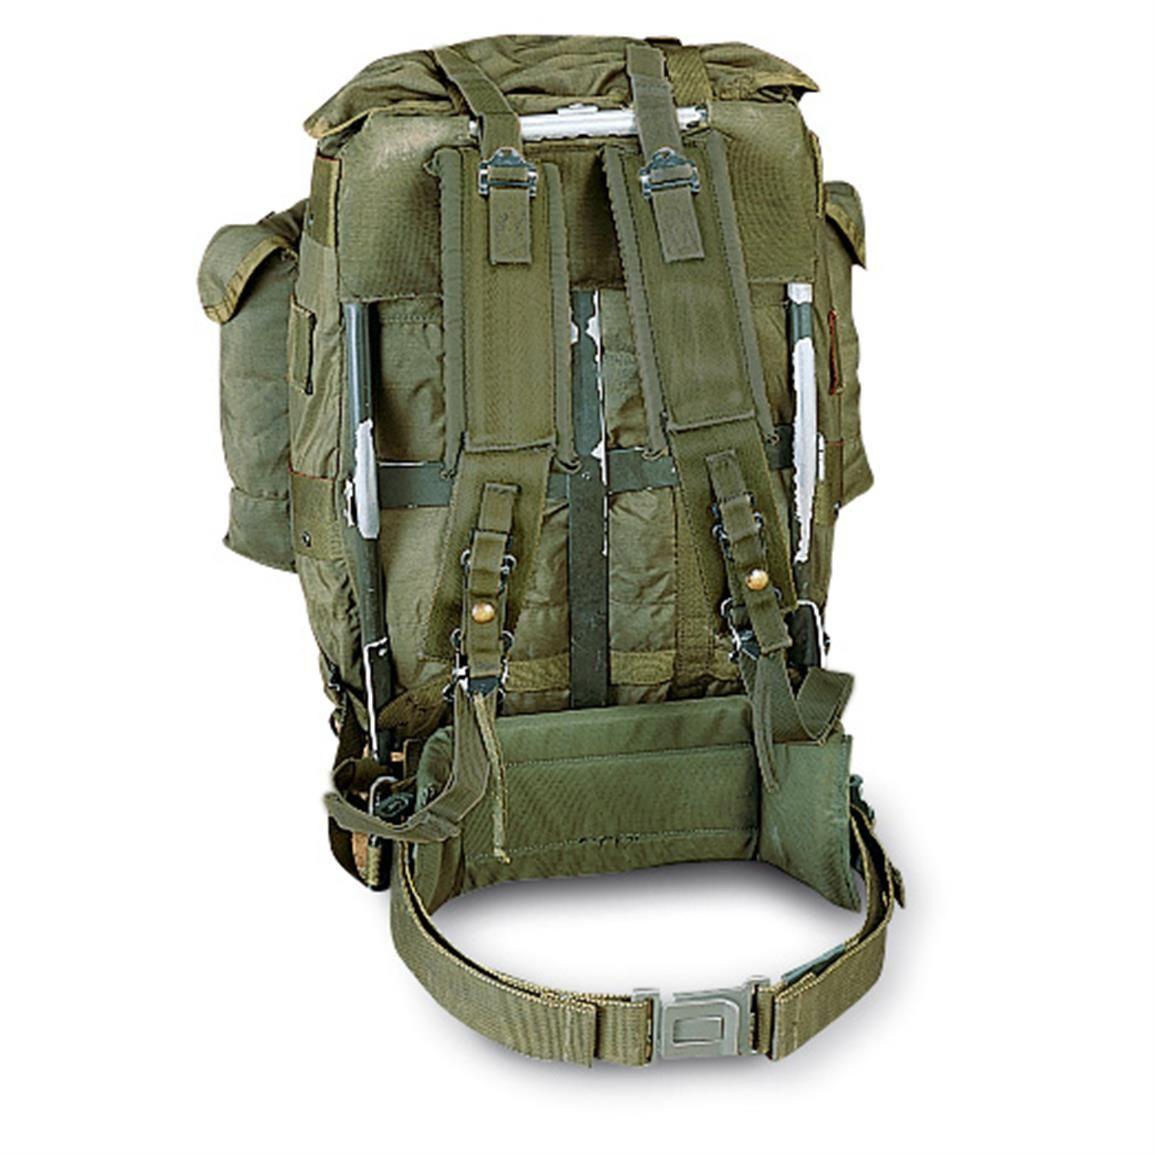 U S Military Surplus Medium Alice Pack With Frame Used 618781 Rucksacks Backpacks At Sportsman S Guide Plecak